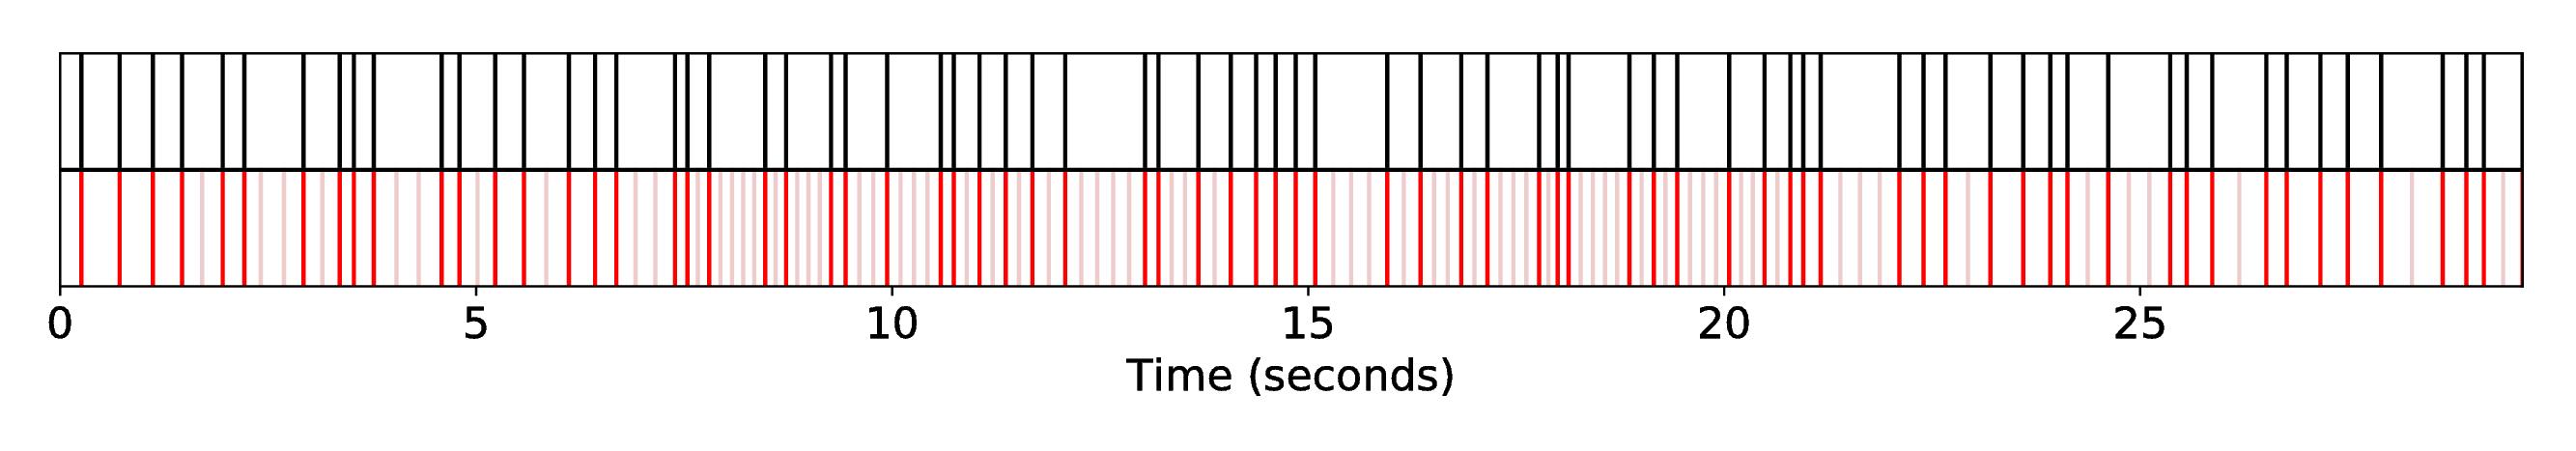 DP1_INT1_R-Syn-Ra__S-Fandango__SequenceAlignment